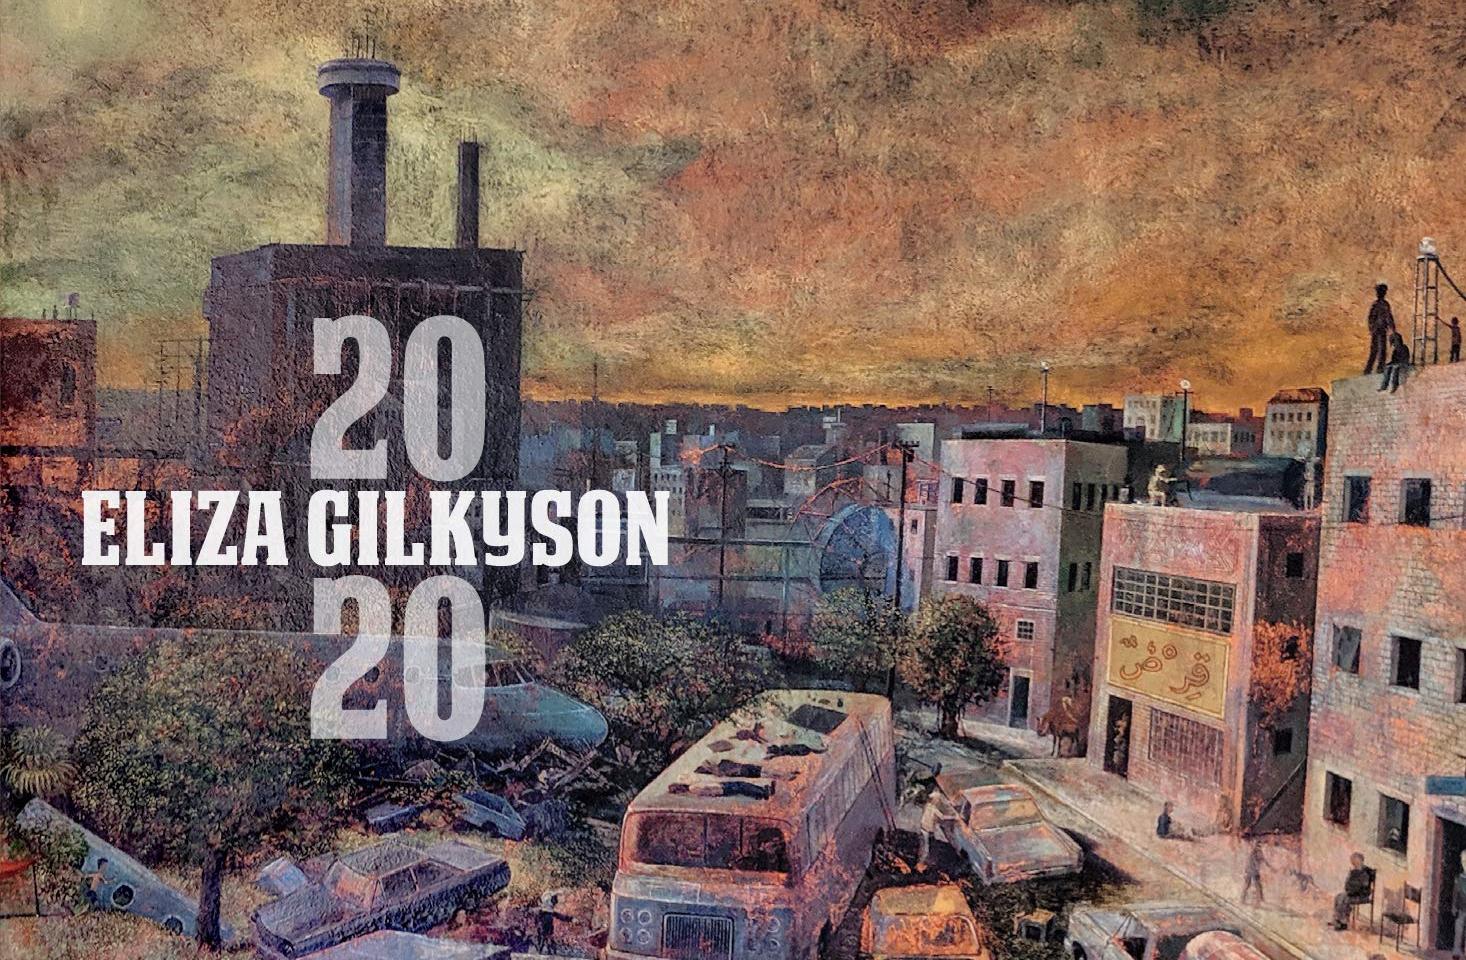 2020, Eliza's latest album, now available